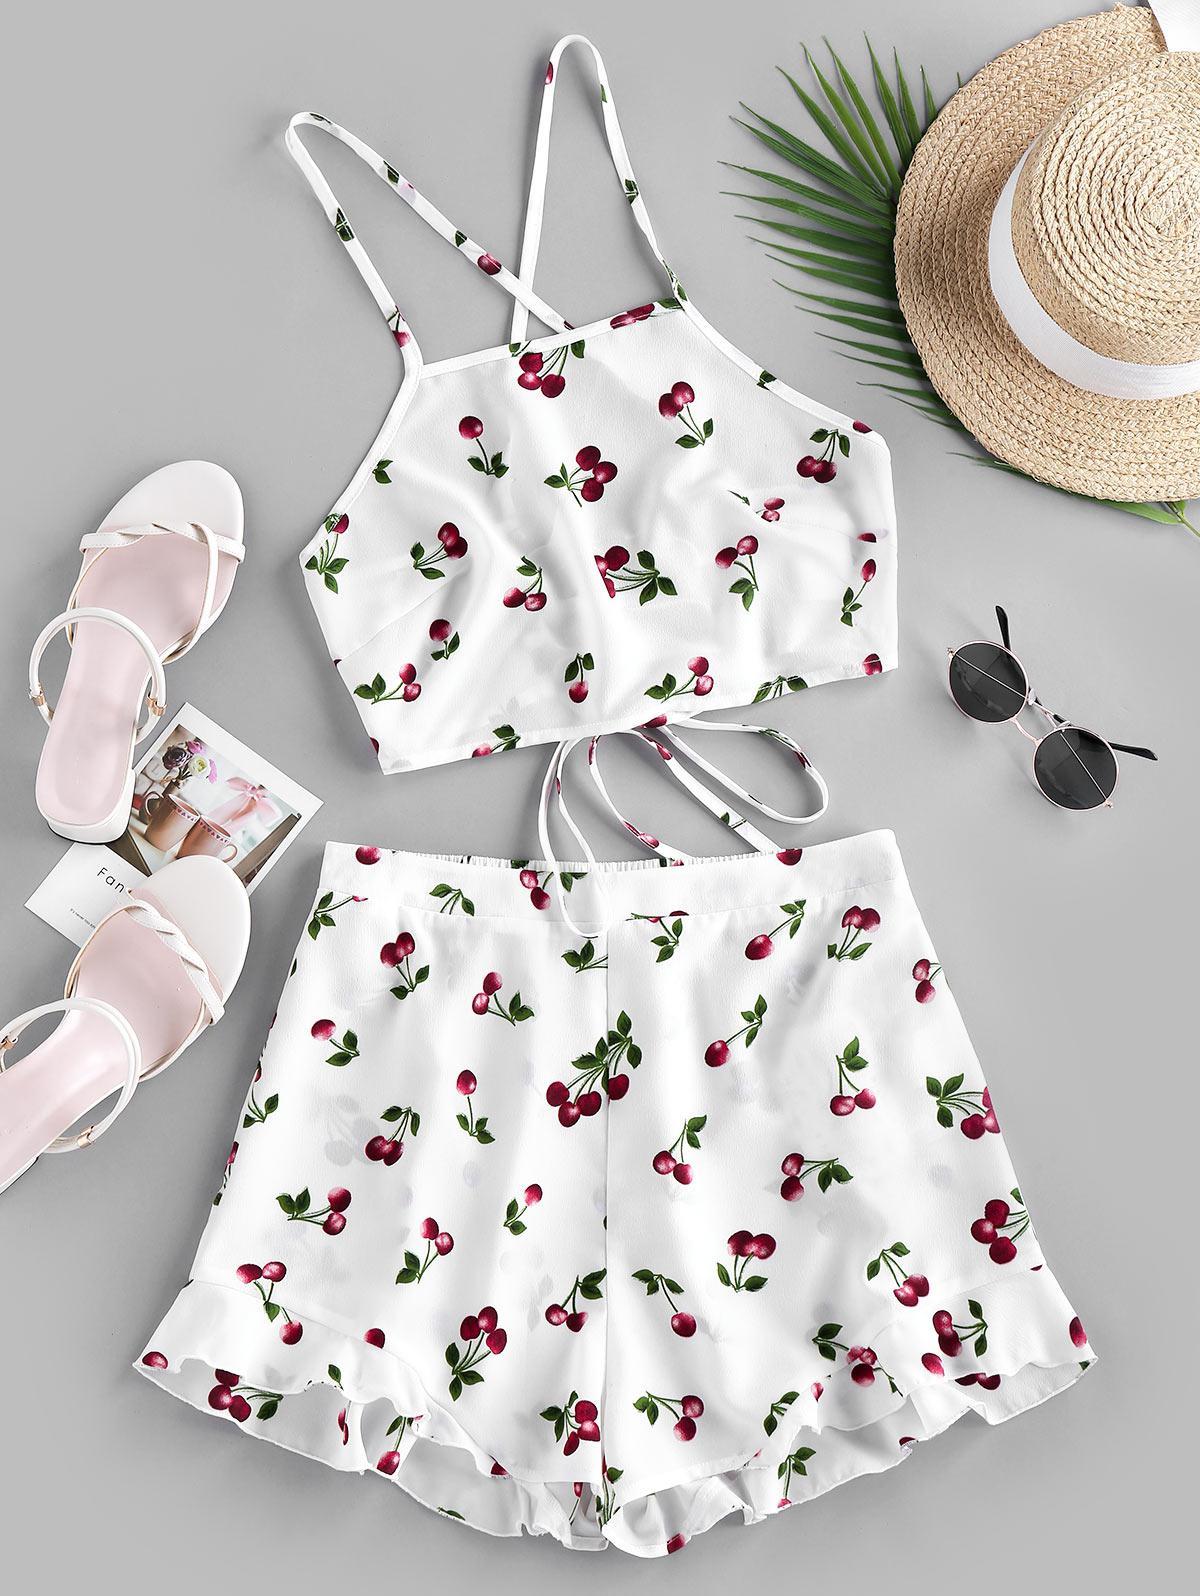 ZAFUL Cherry Print Lace Up Co Ord Set